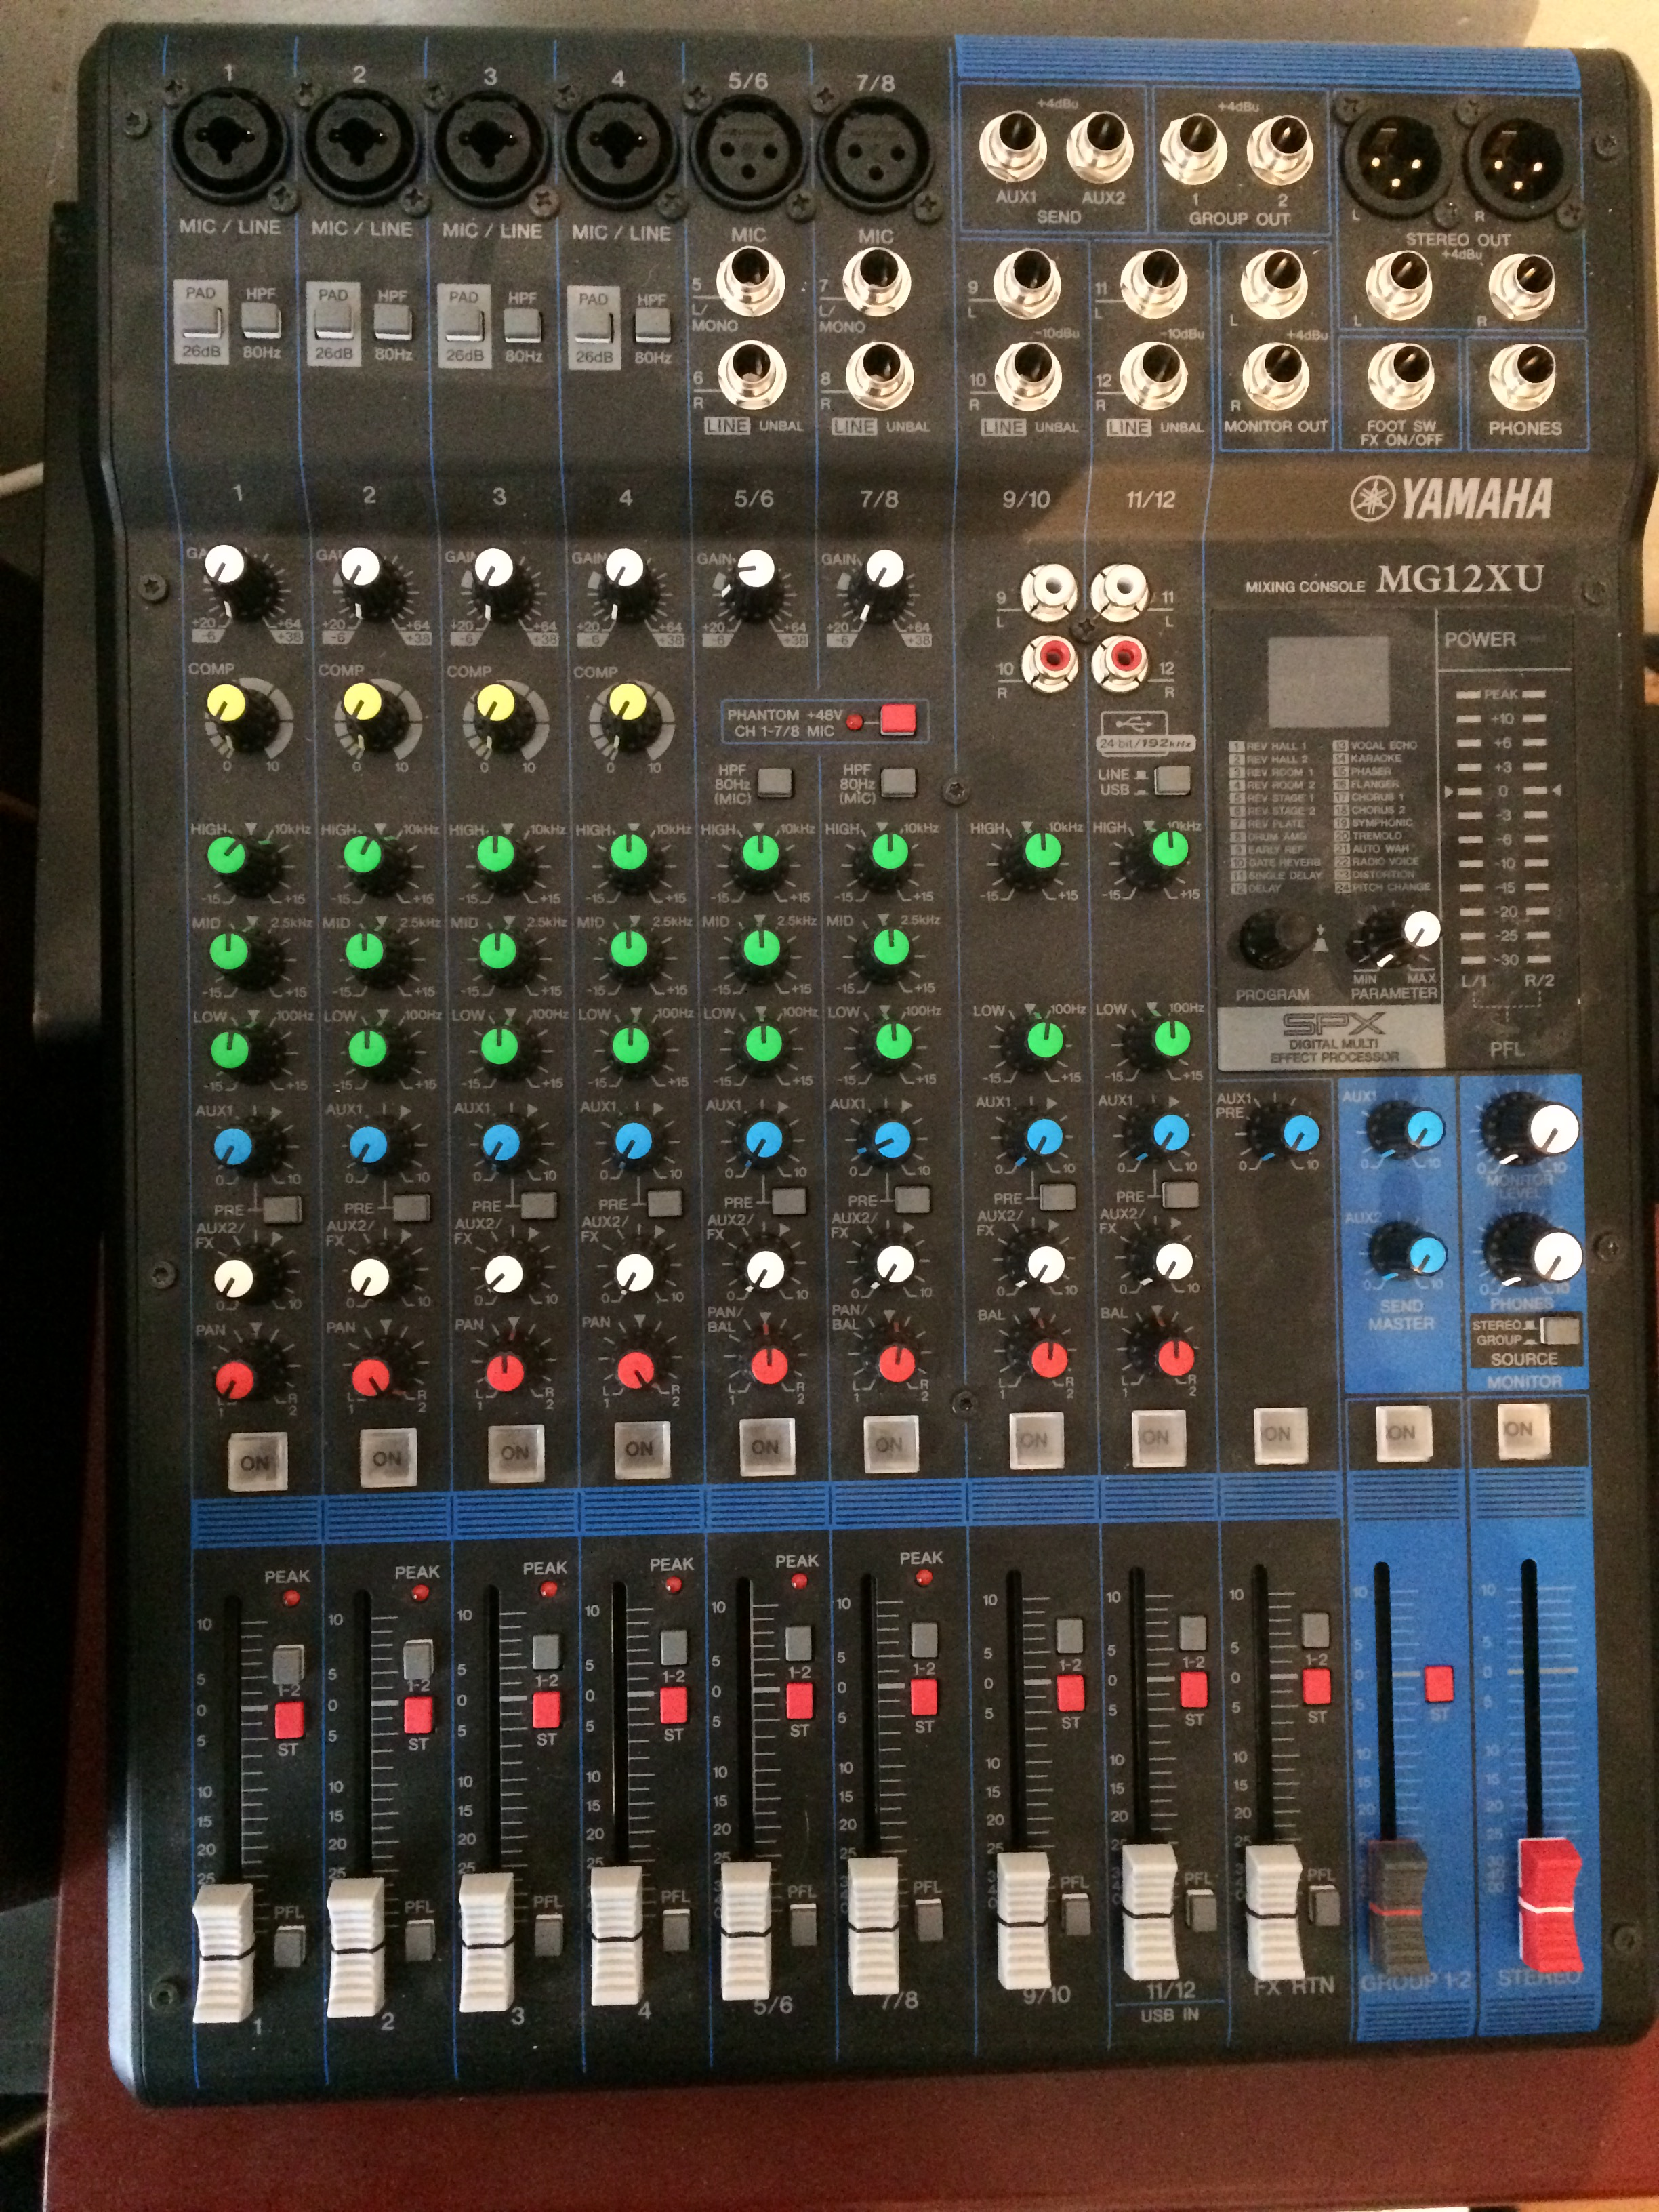 vend table de mixage yamaha mg12 xu (4 mono + 4 stéréo + tranche